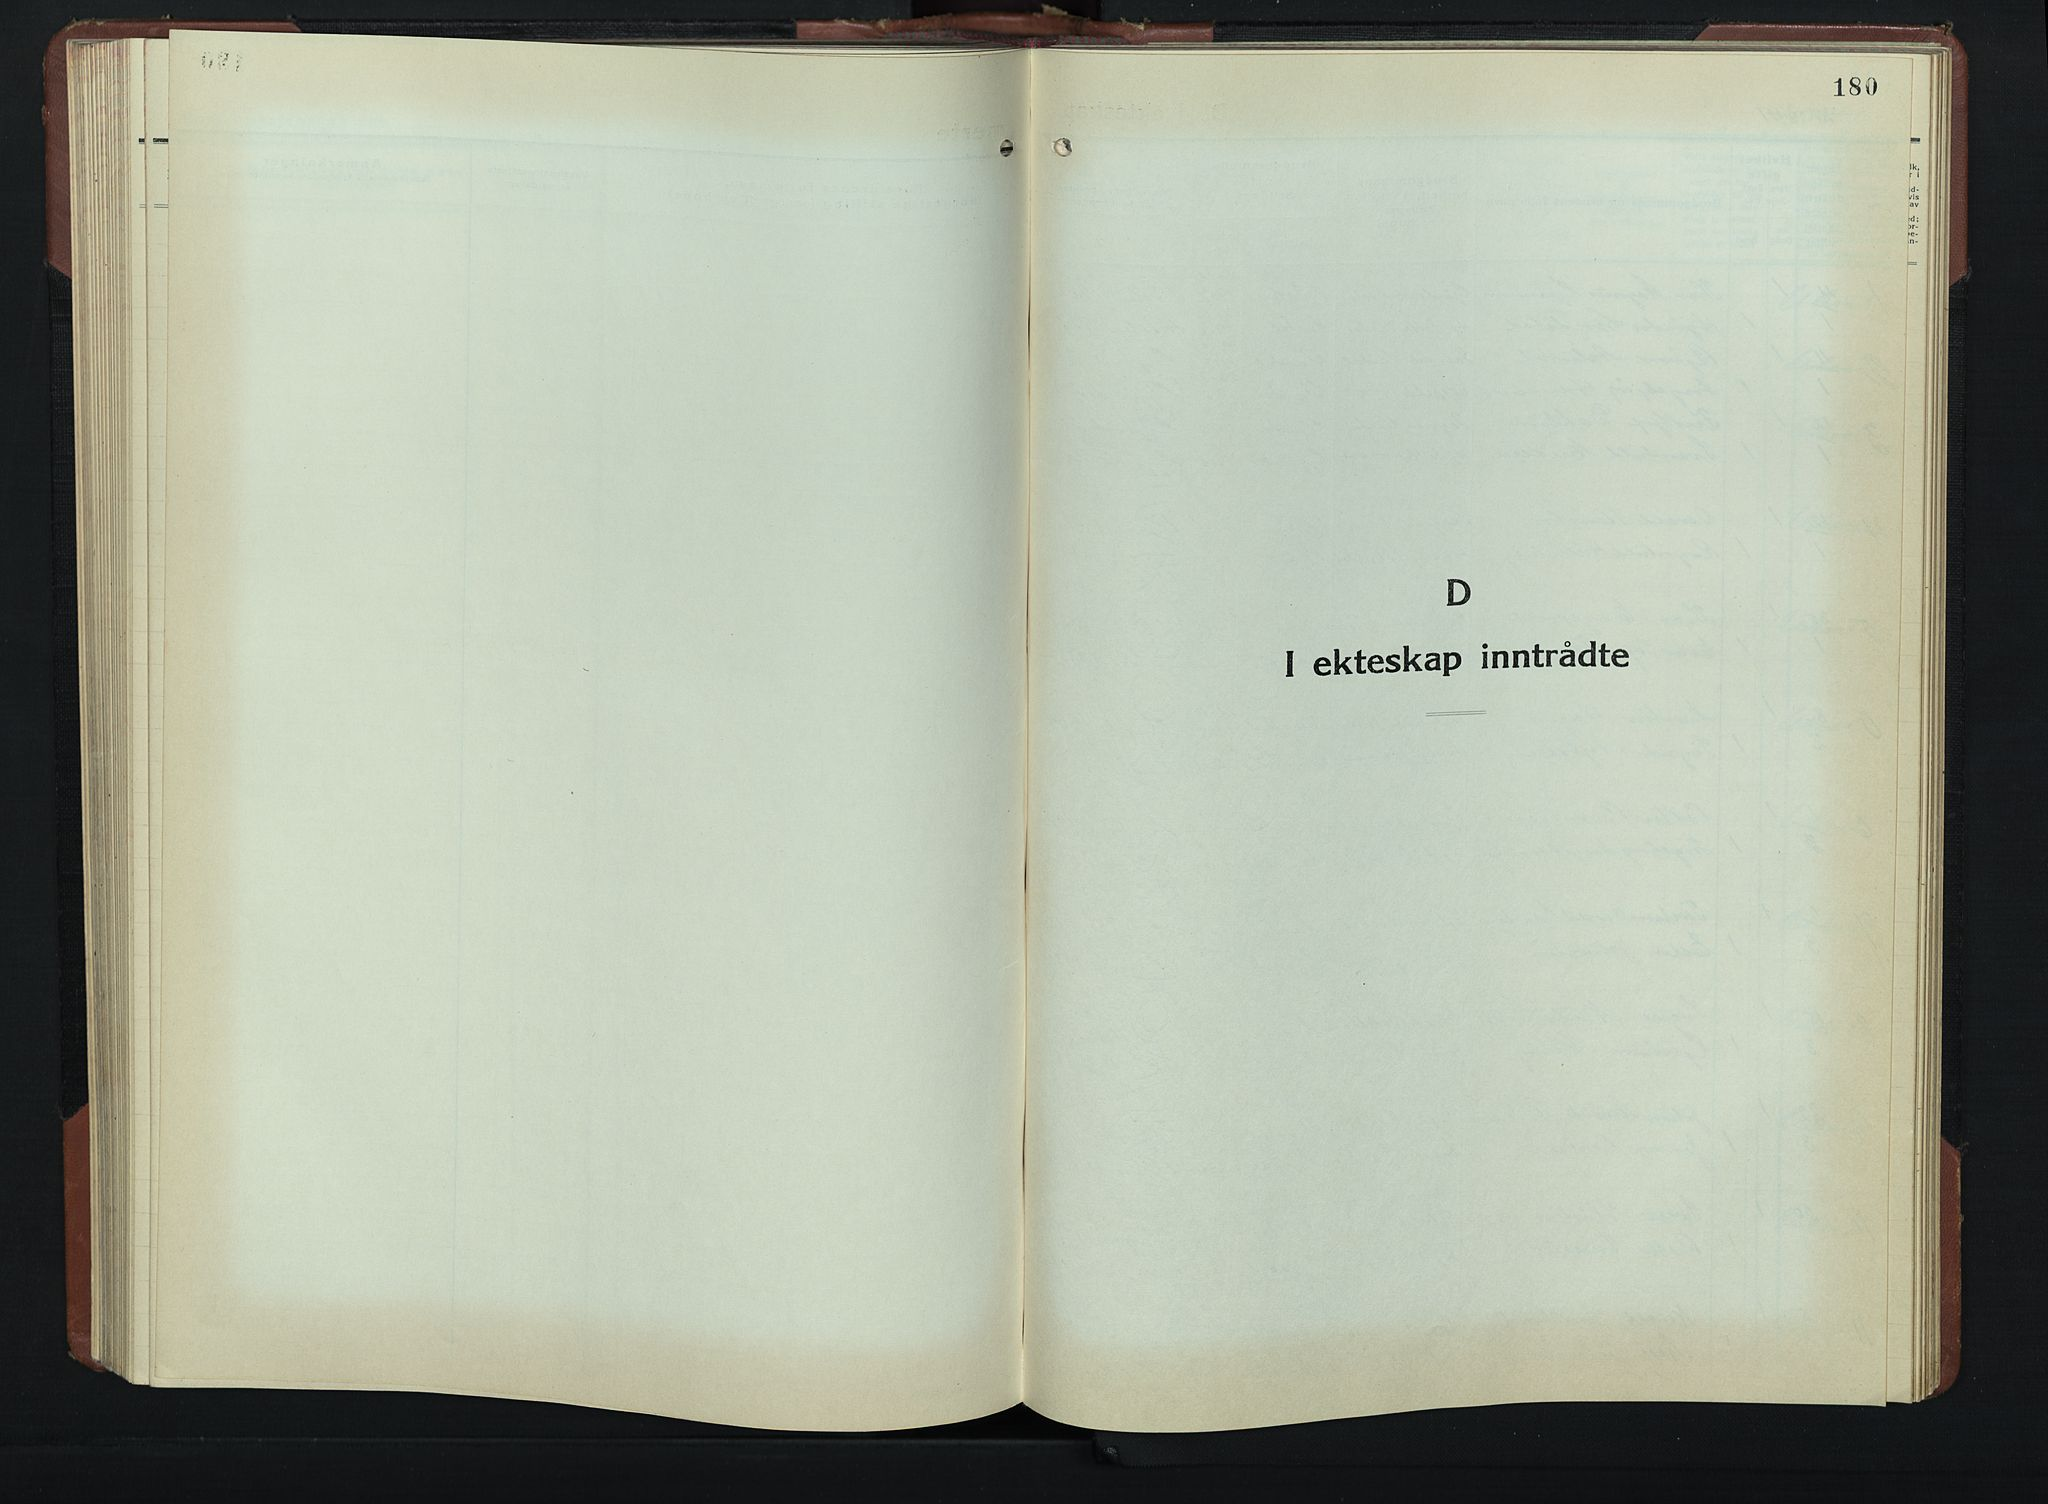 SAH, Vardal prestekontor, H/Ha/Hab/L0019: Klokkerbok nr. 19, 1941-1951, s. 180